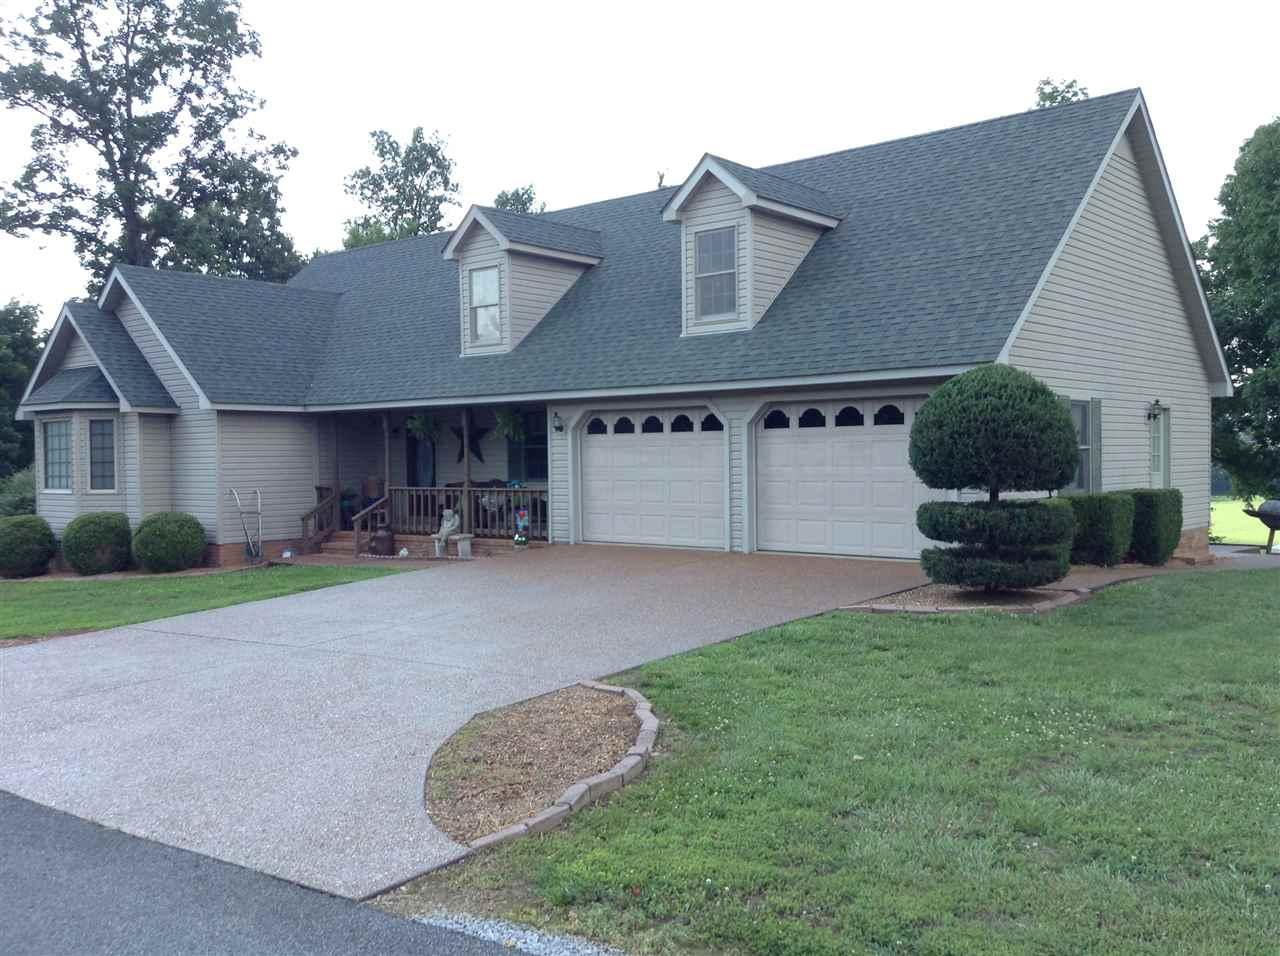 Real Estate for Sale, ListingId: 33817740, Benton,KY42025